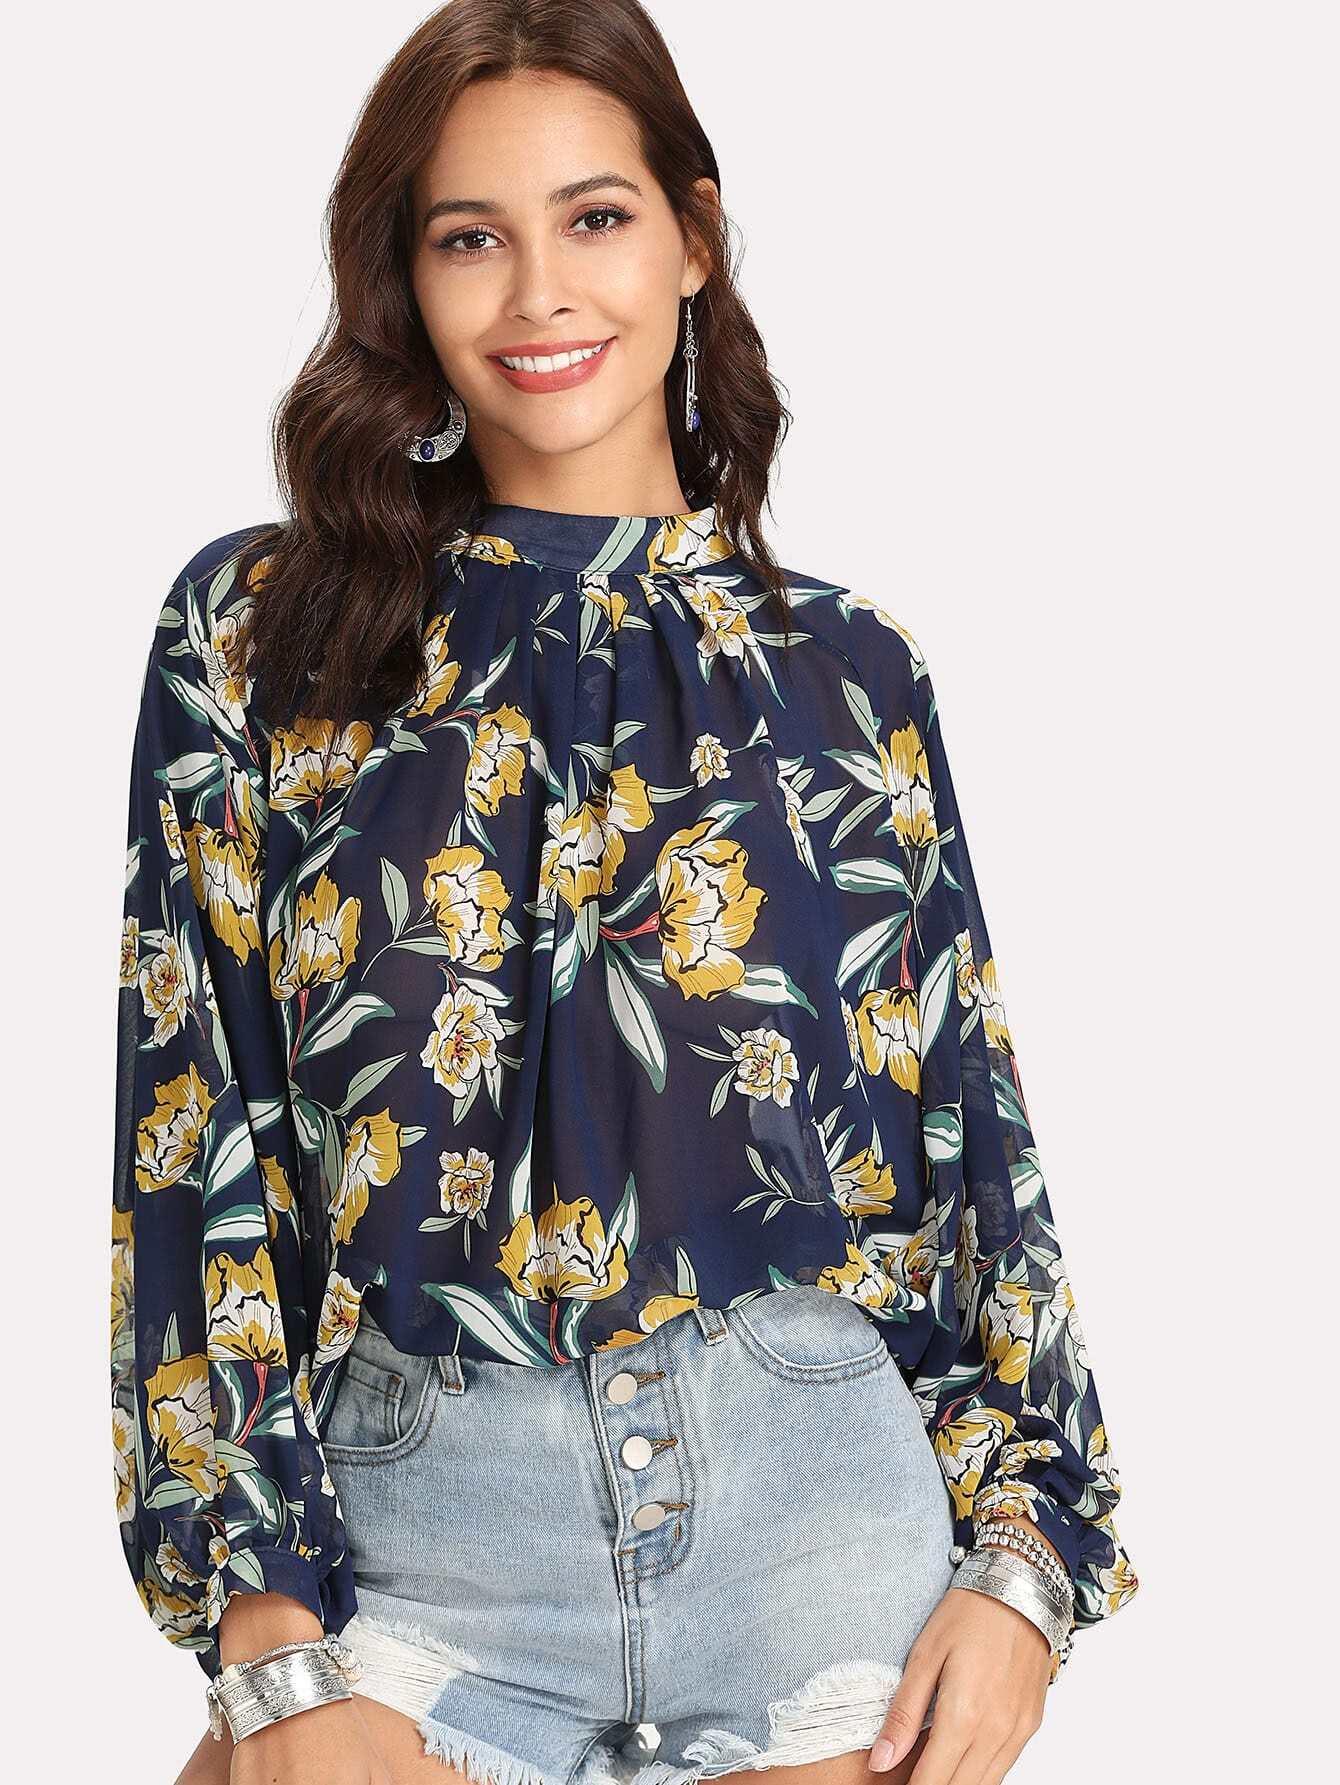 V Cut Back Floral Print Blouse cut out back daisy print blouse